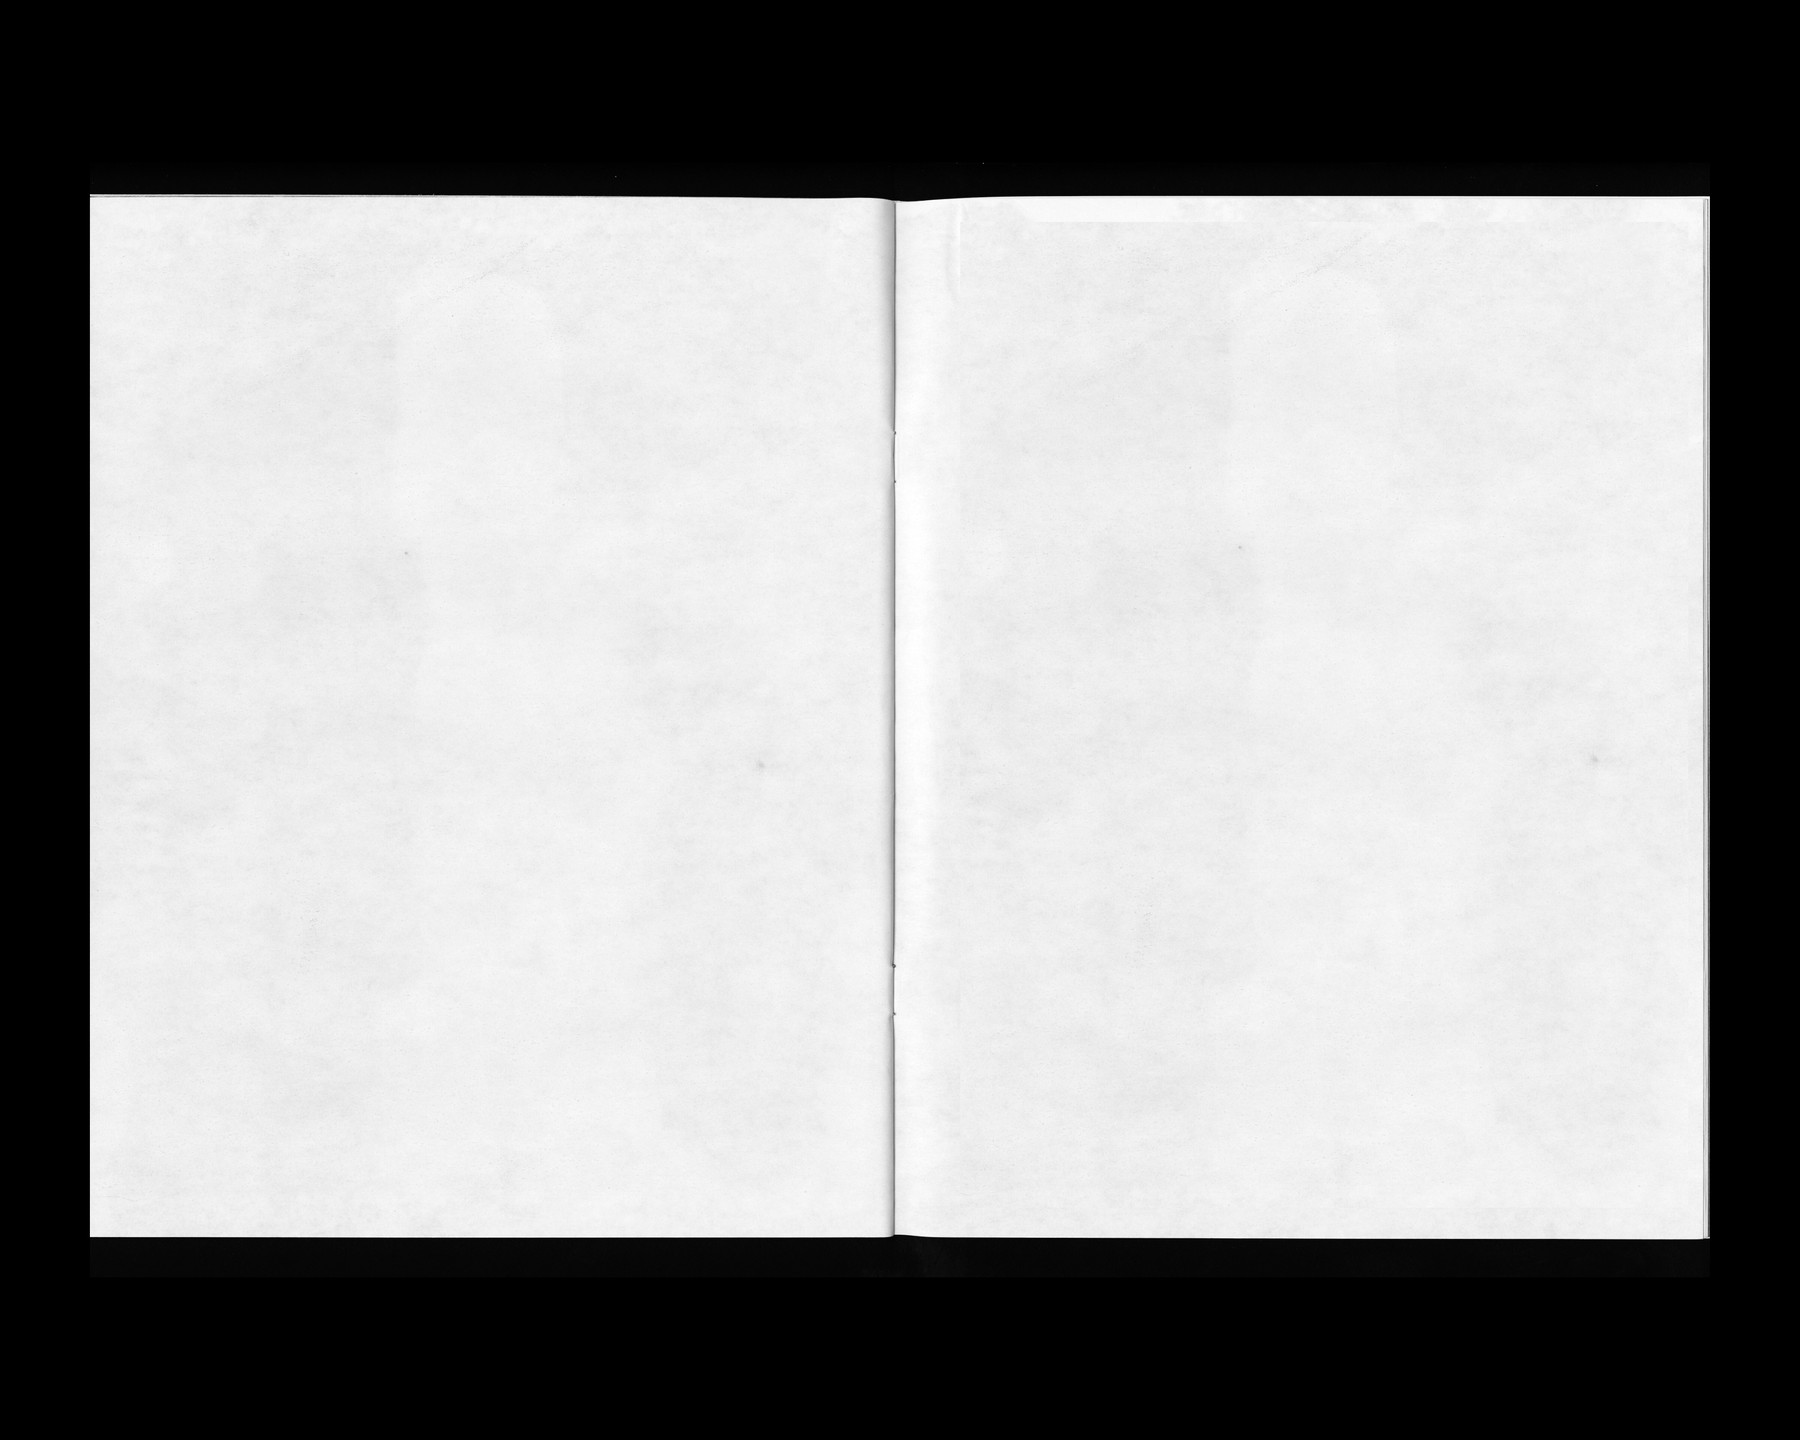 box-image3.jpg